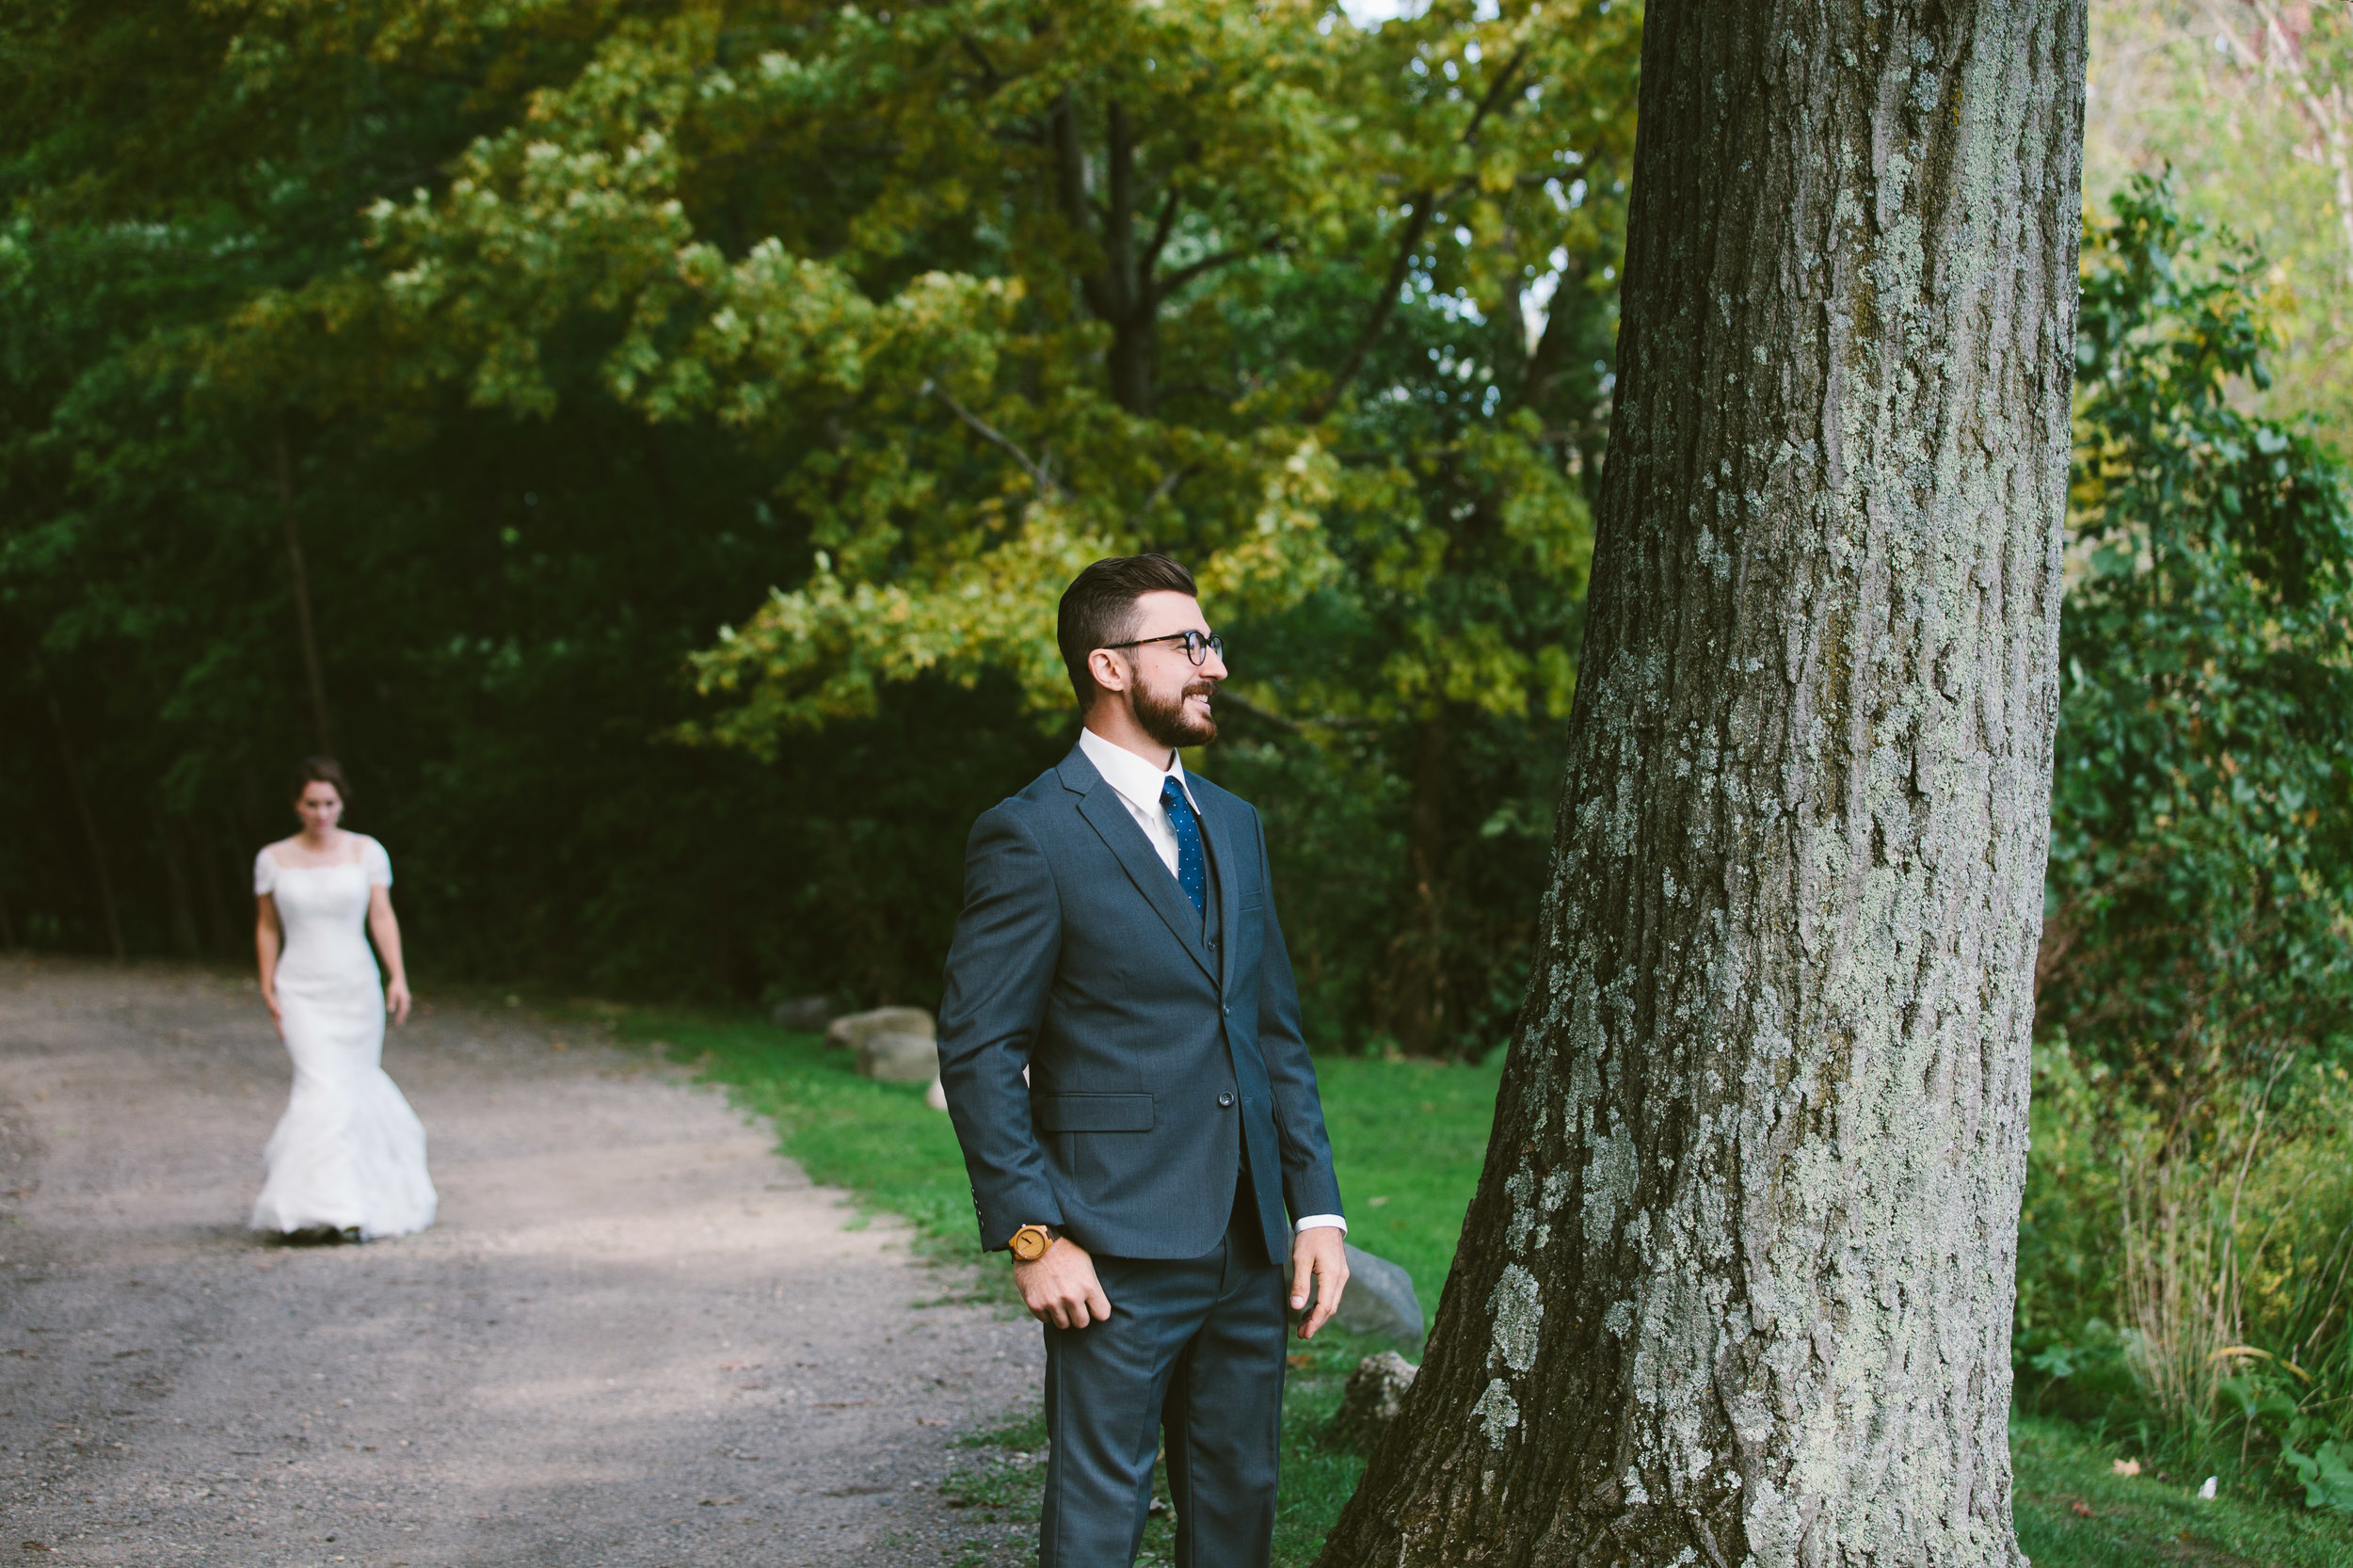 grand_rapids_wedding_rockford_wedding_richard_app_gallery_wedding_grand_rapids_wedding_photographer_summer_wedding_wabasis_lake_park_wedding_rustic_wedding-8.jpg